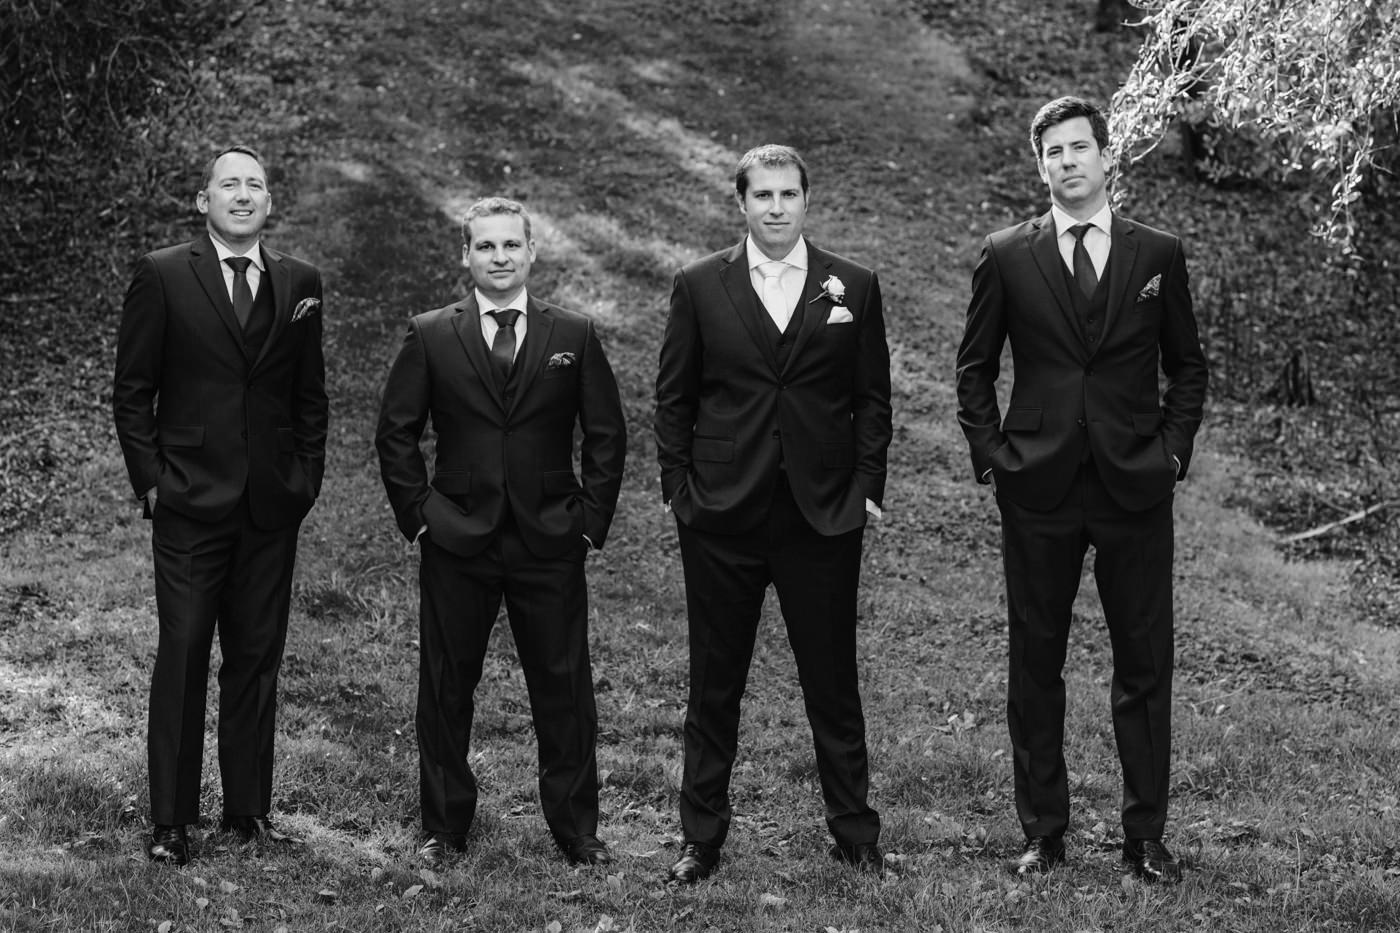 bracu_wedding_photos1048a.jpg